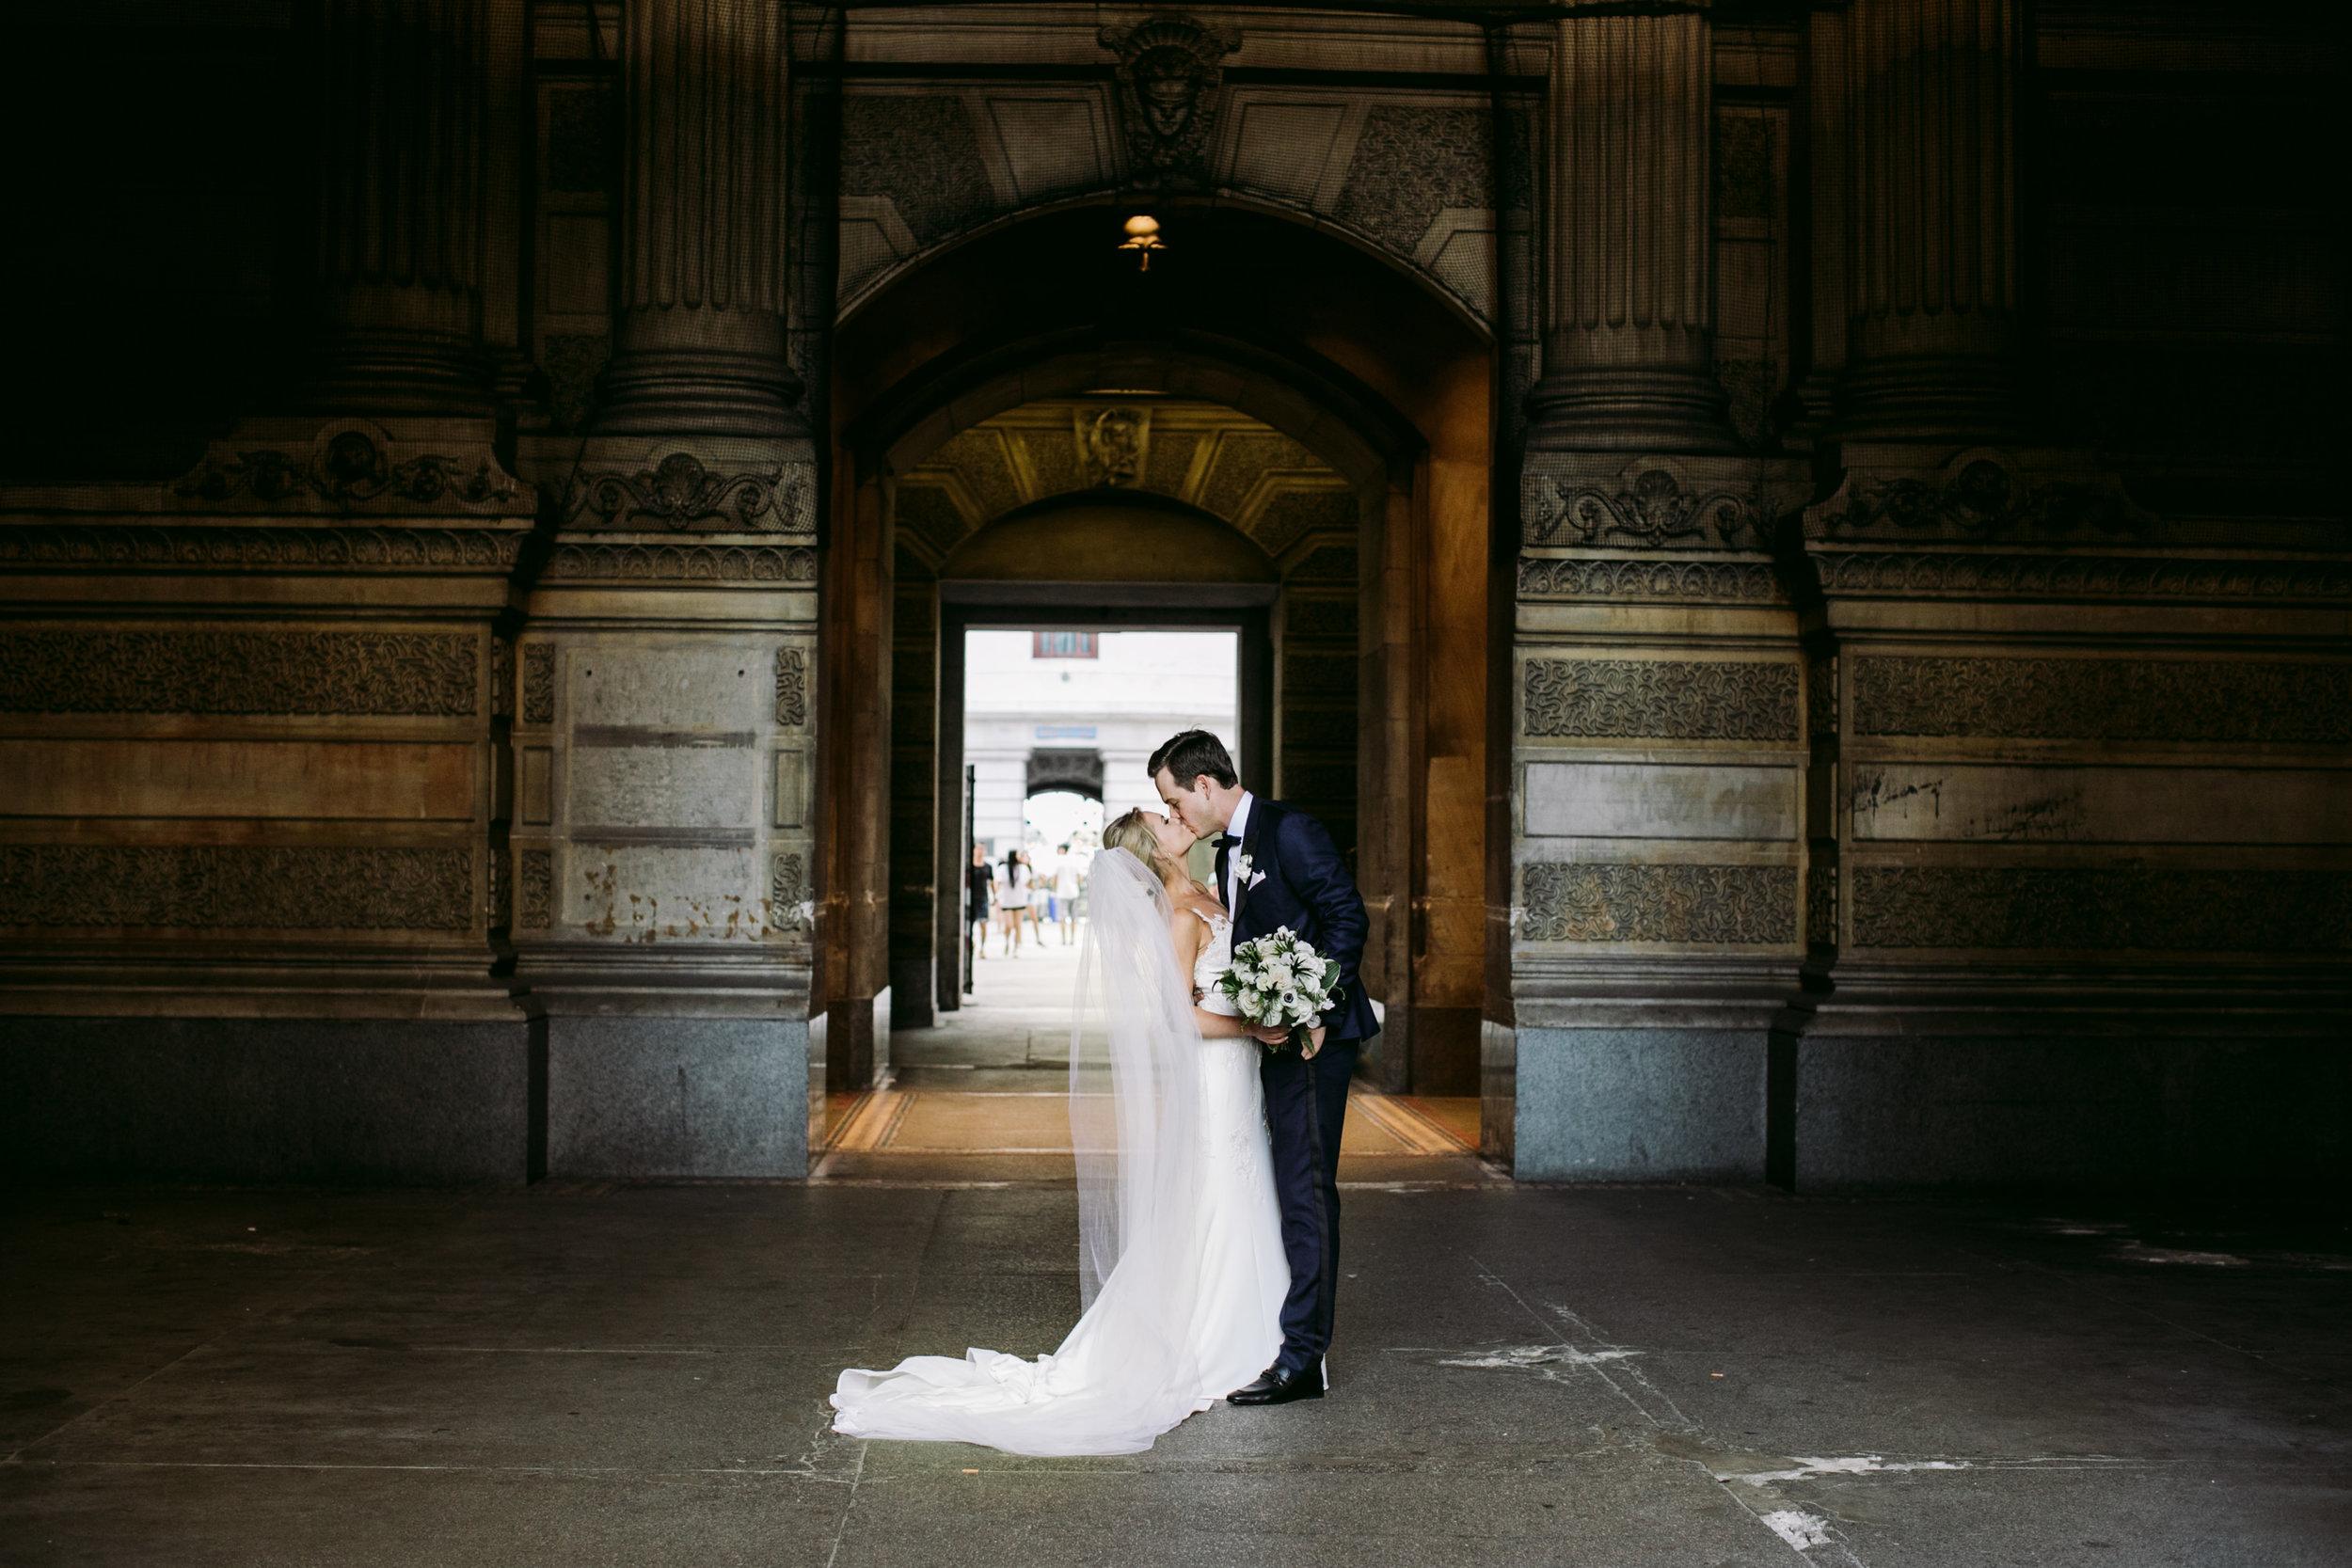 photography-wedding-weddings-natural-candid-union league-philadelphia-black tie-city hall-broad street-editorial-modern-fine-art-01.JPG